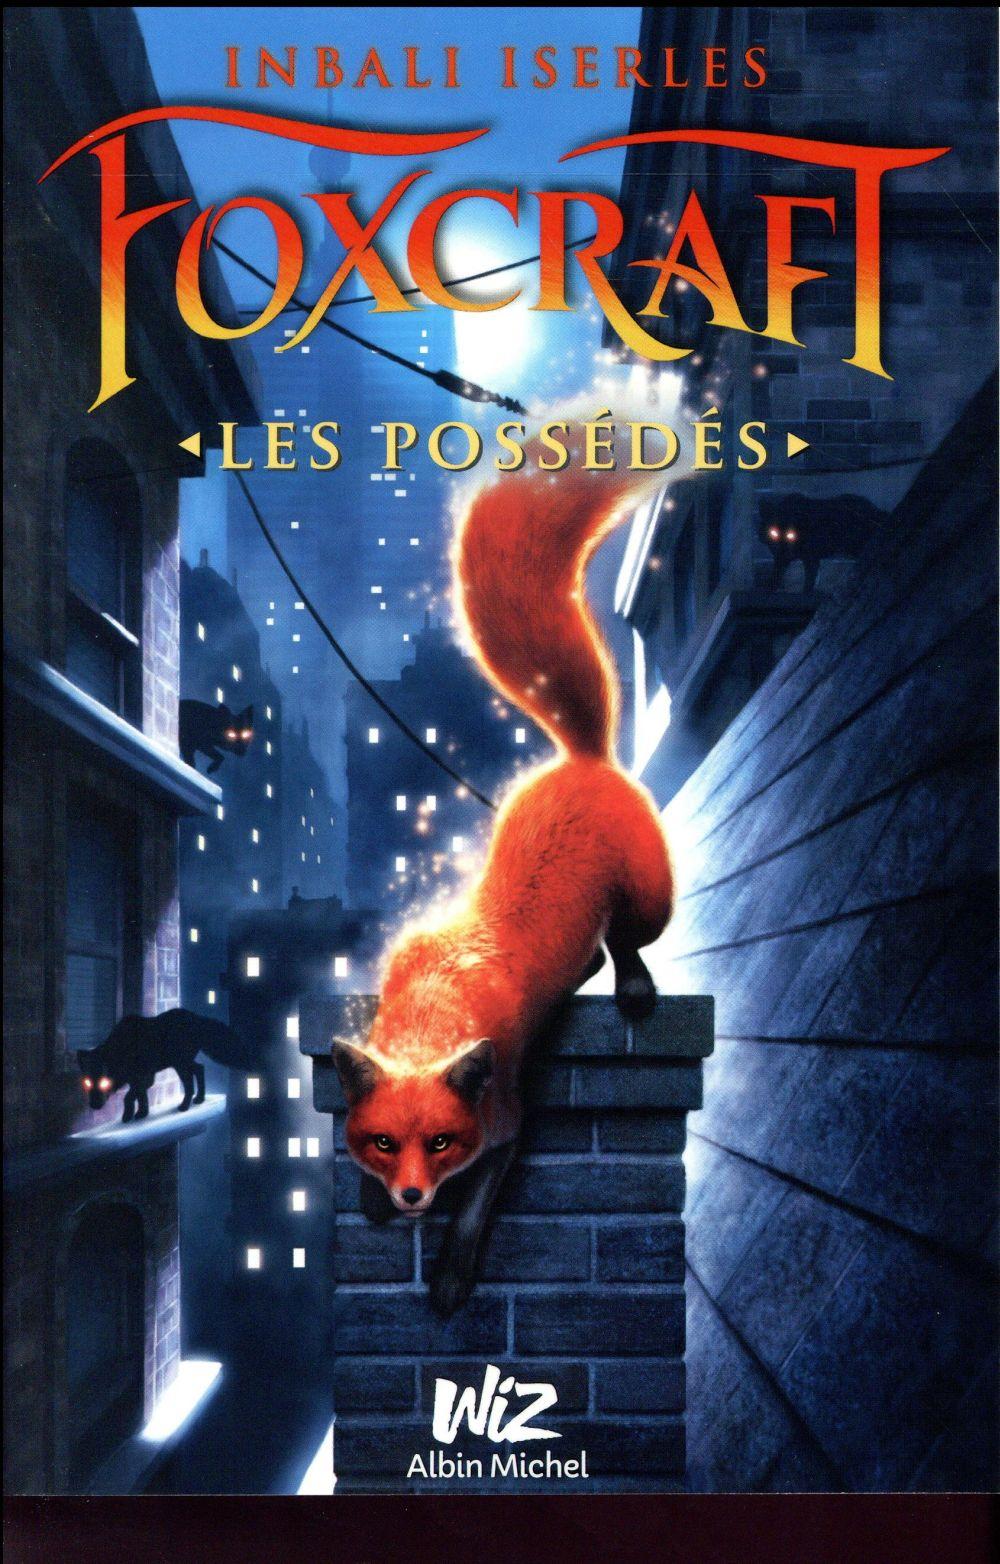 FOXCRAFT - TOME 1